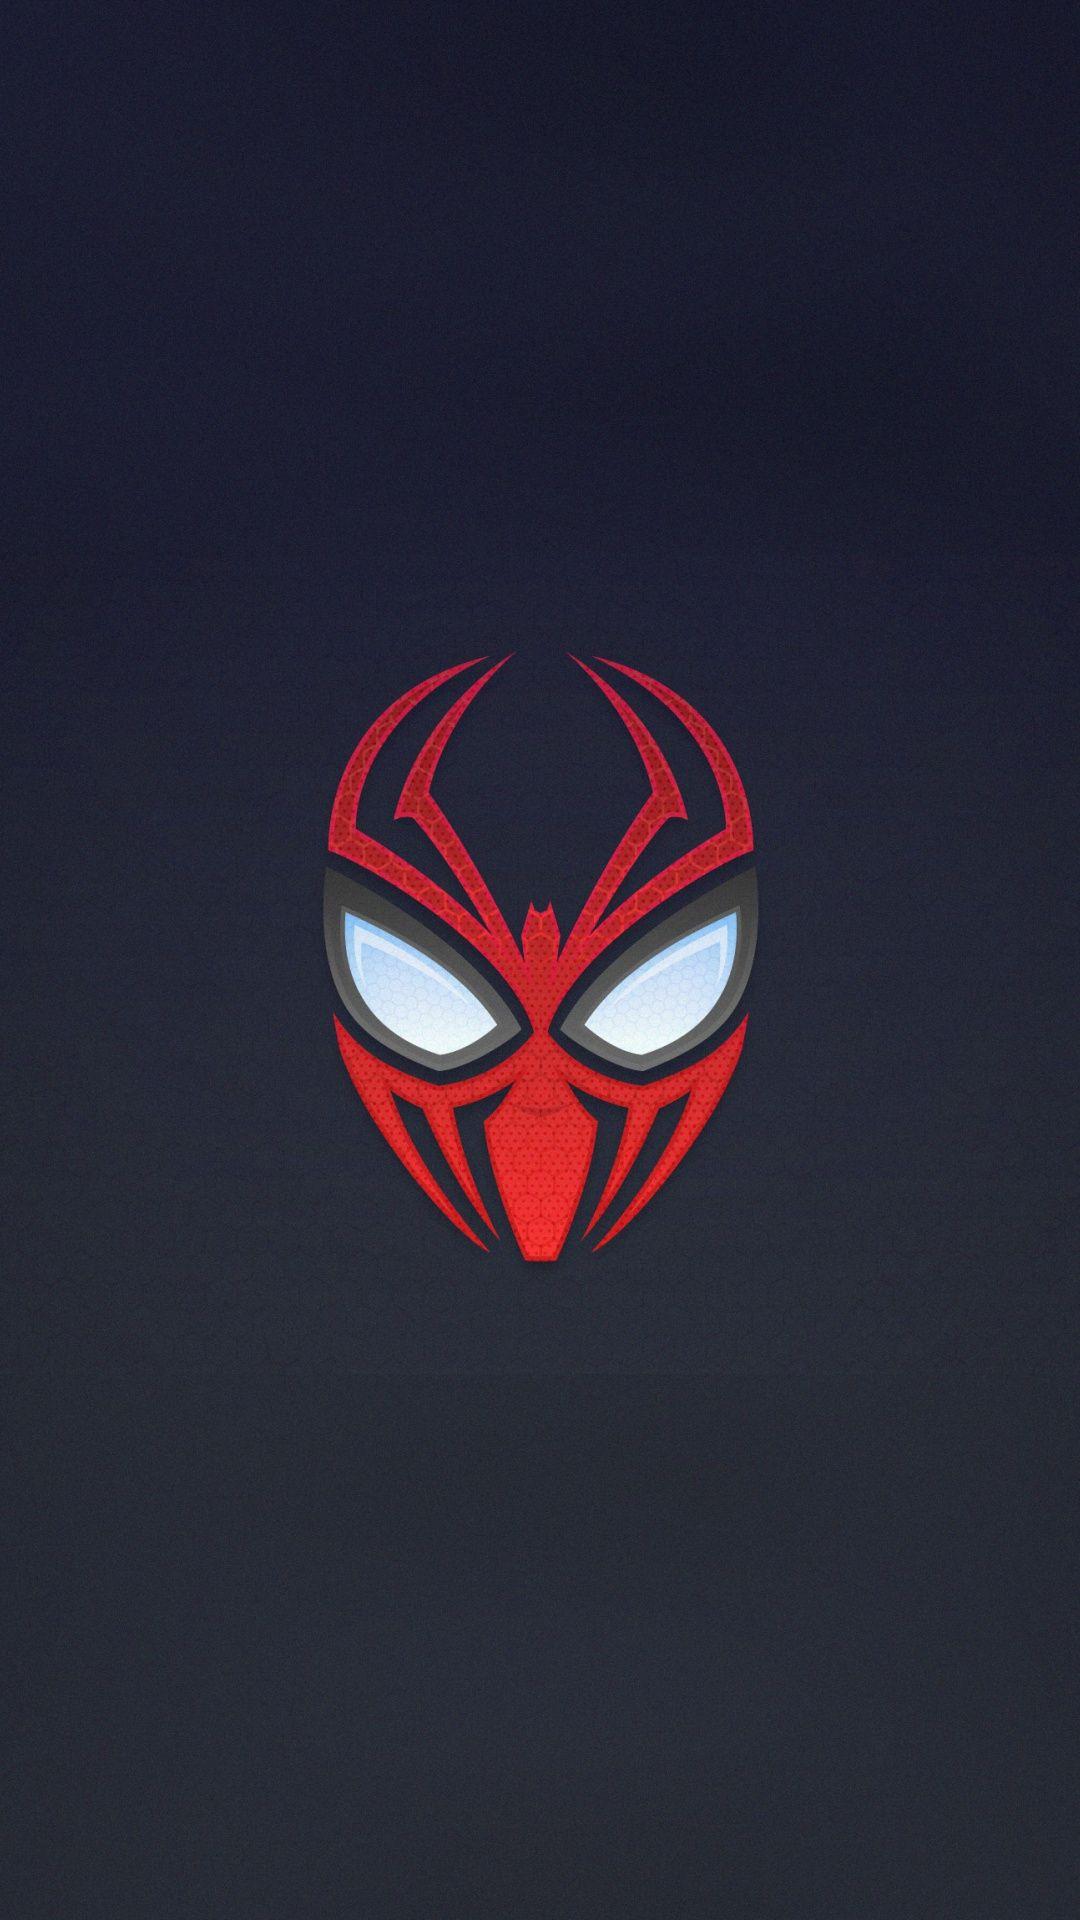 Spiderman, logo, artwork wallpaper Spiderman, Marvel